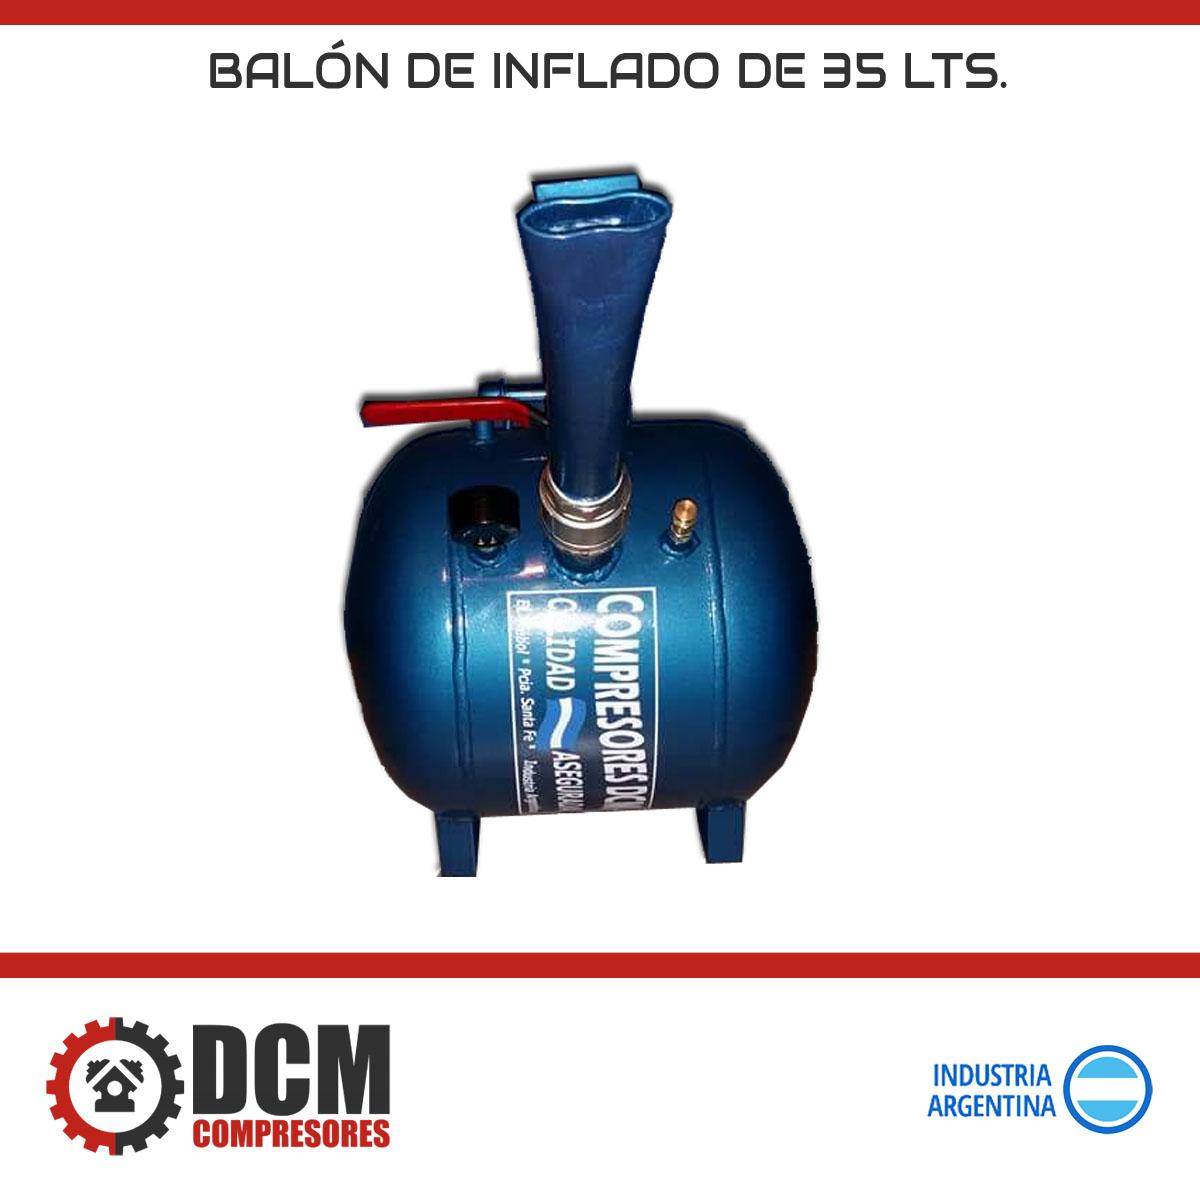 Balón de inflado de 35 lts